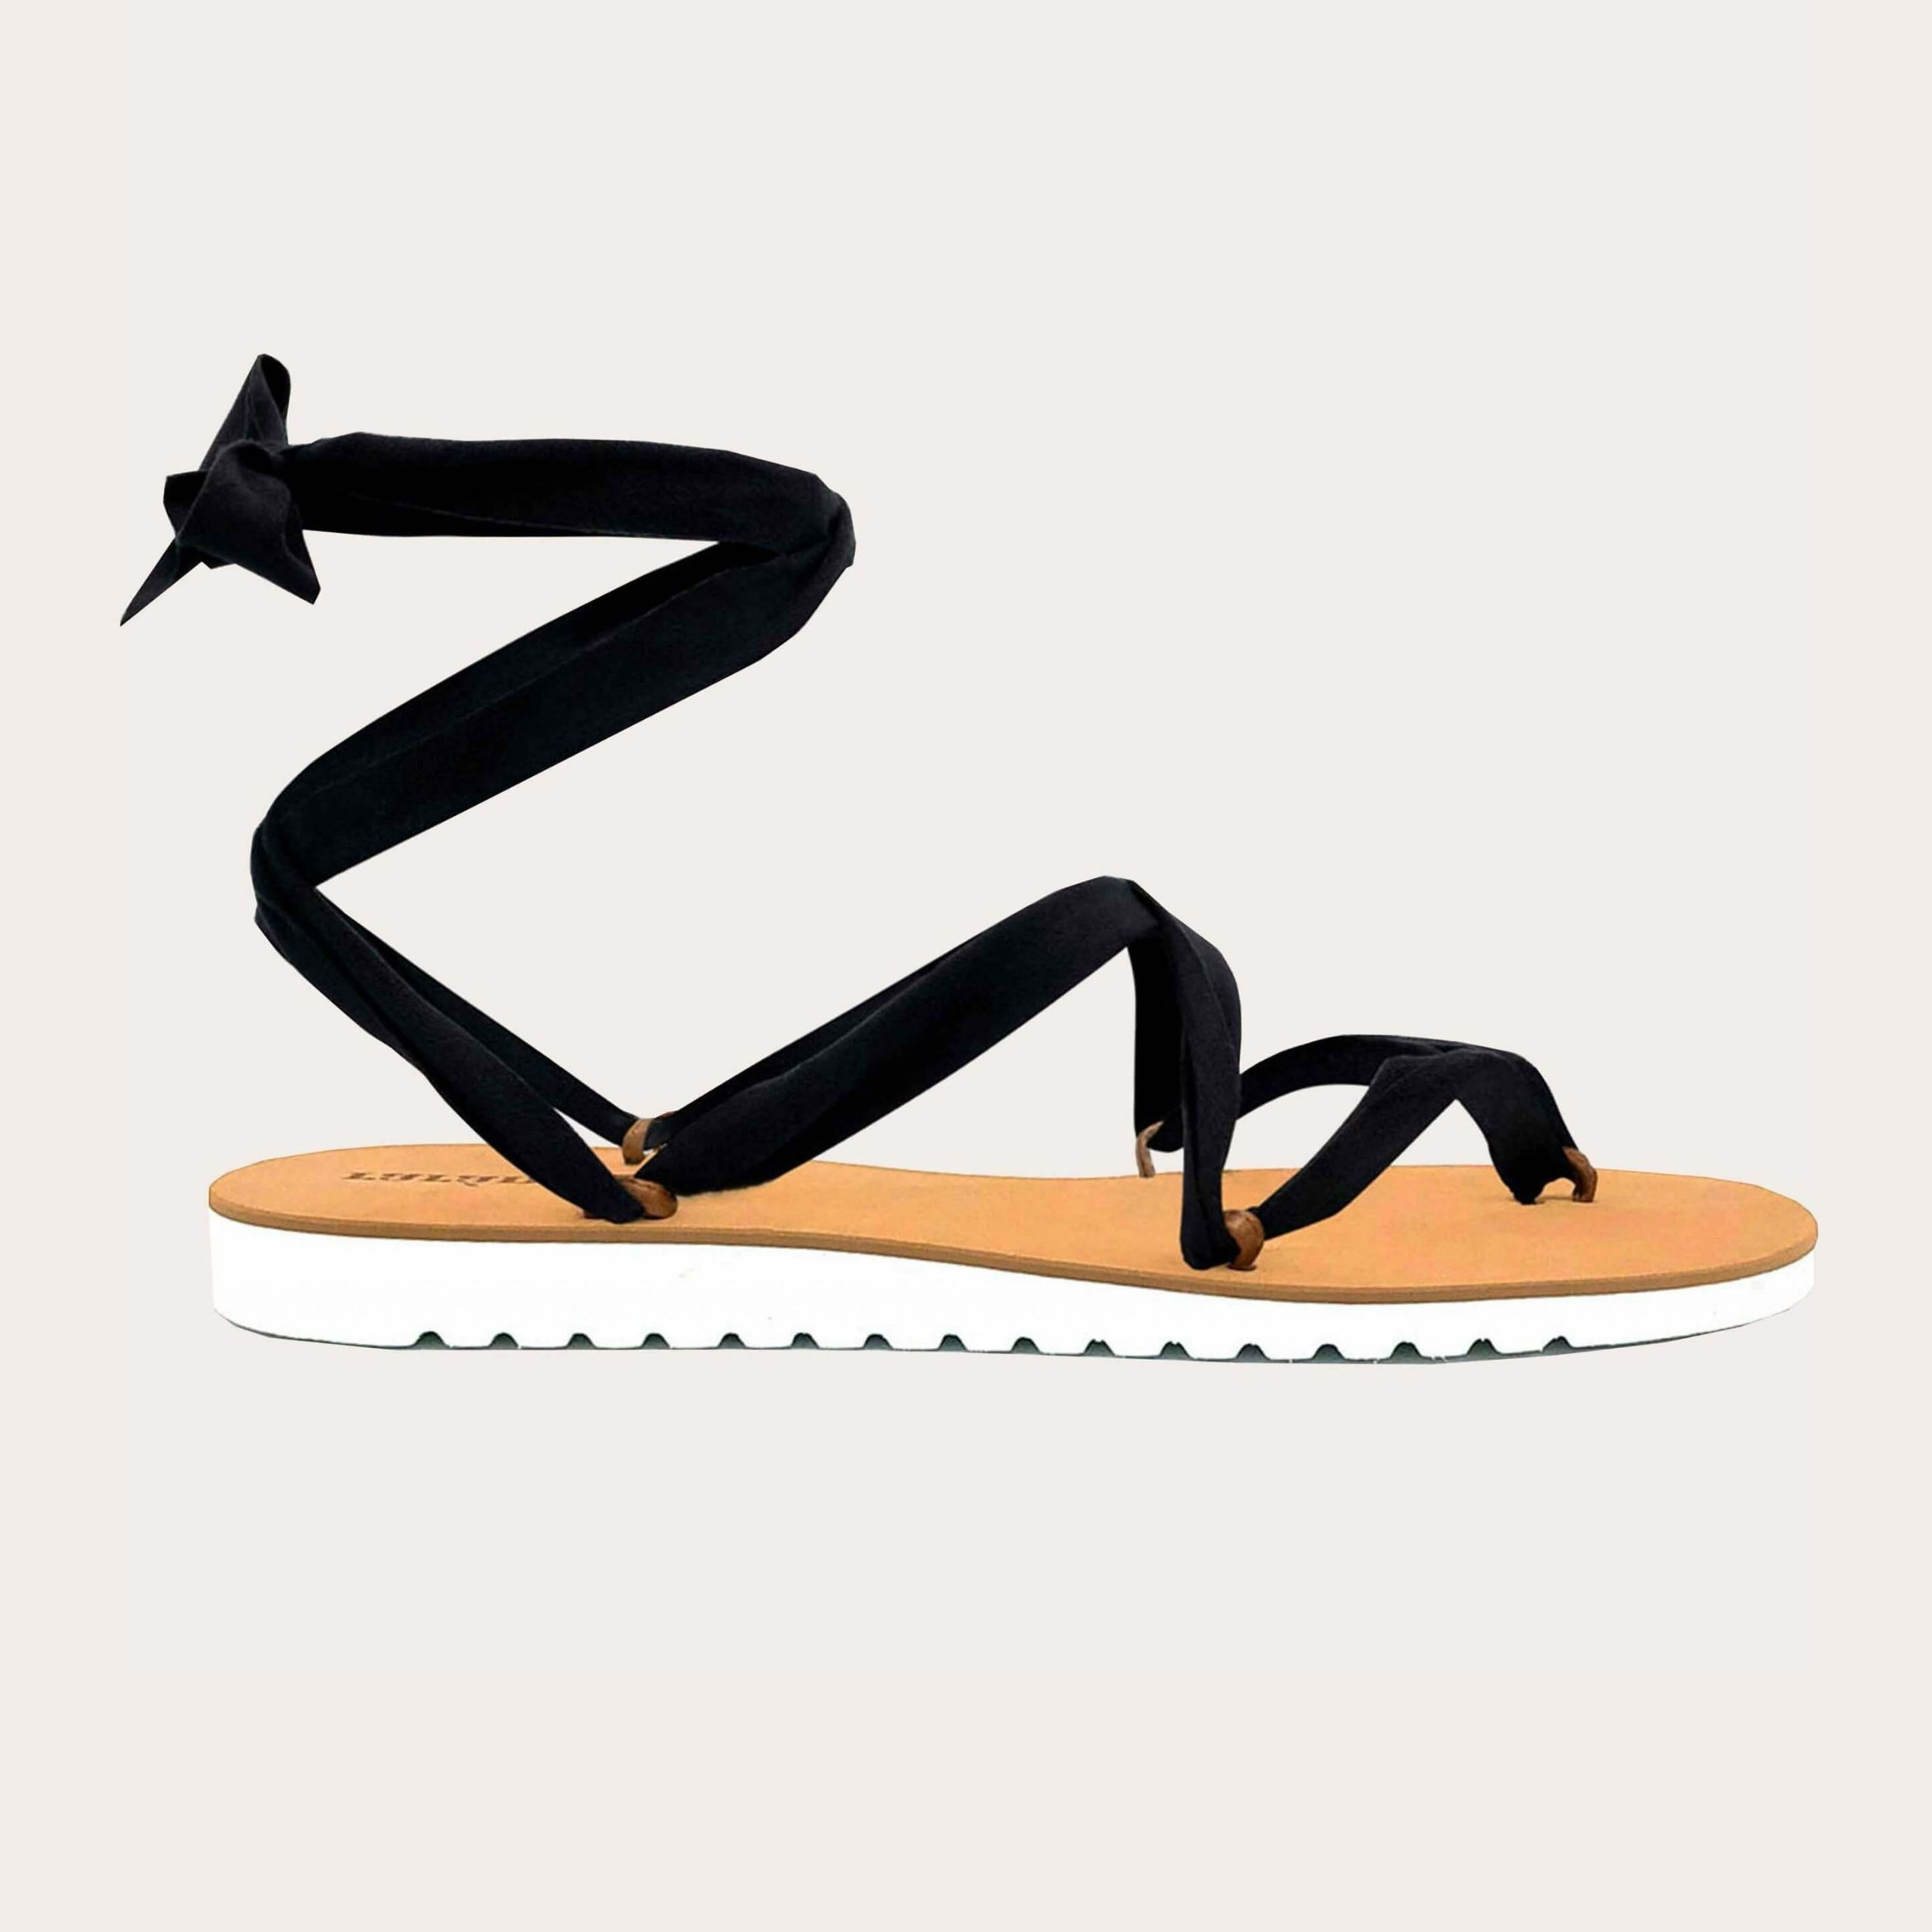 chalco-vegan-1_lintsandalen sandals travelsandals vegan sustainable sandals wikkelsandalen